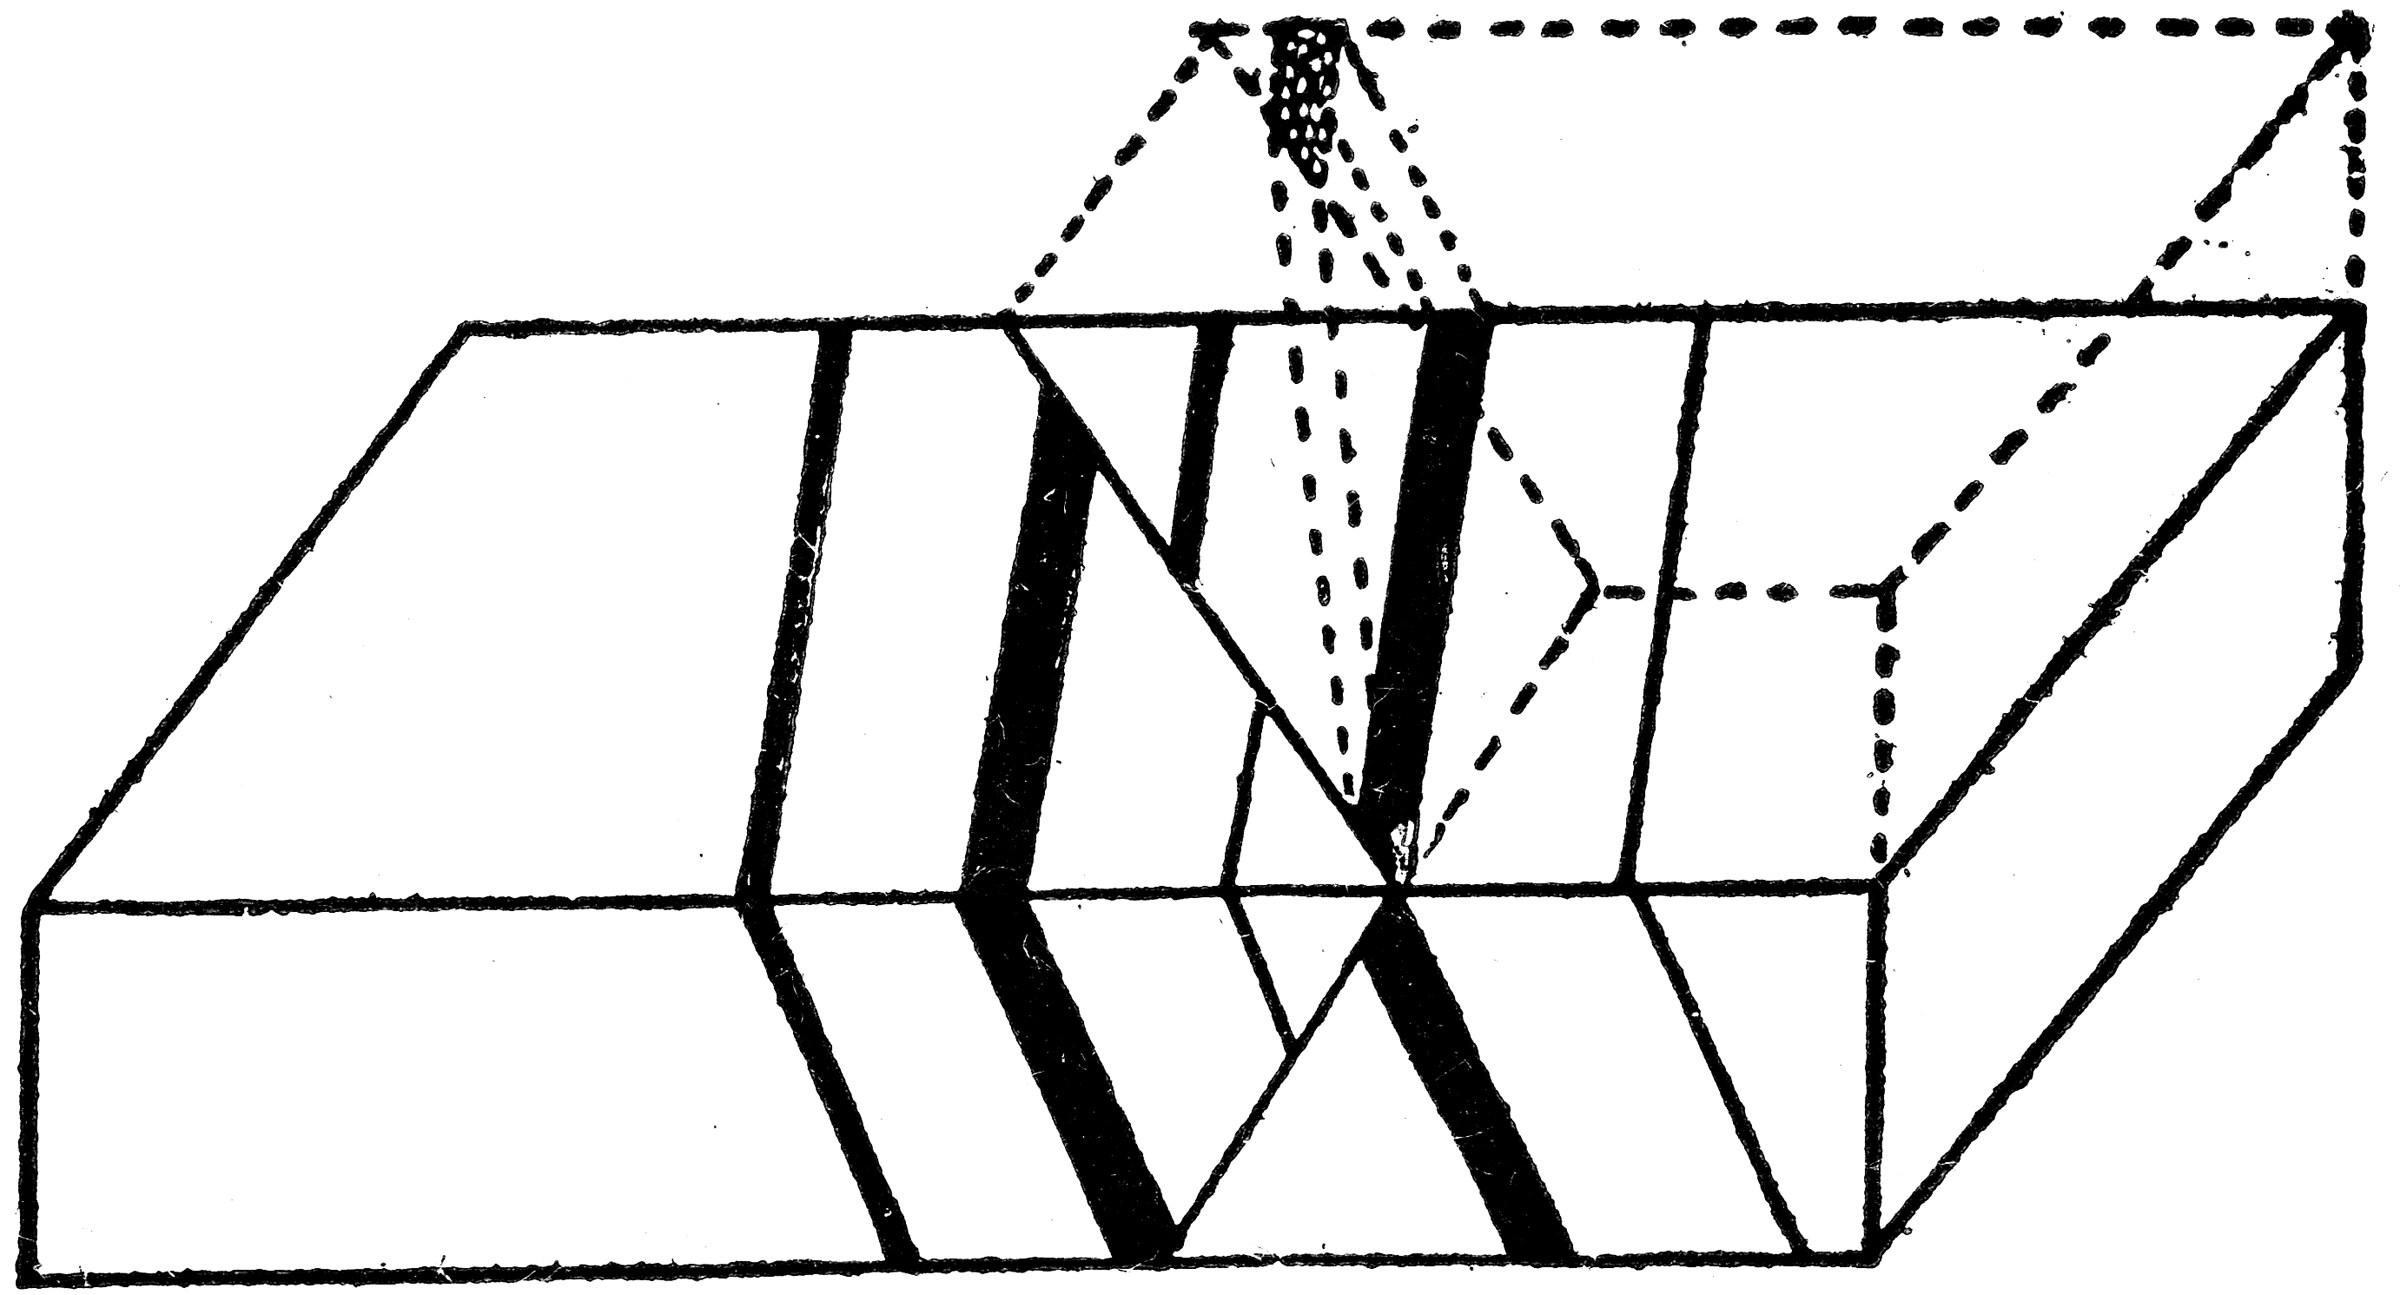 fault block diagram 98 f150 ignition wiring thrust clipart etc